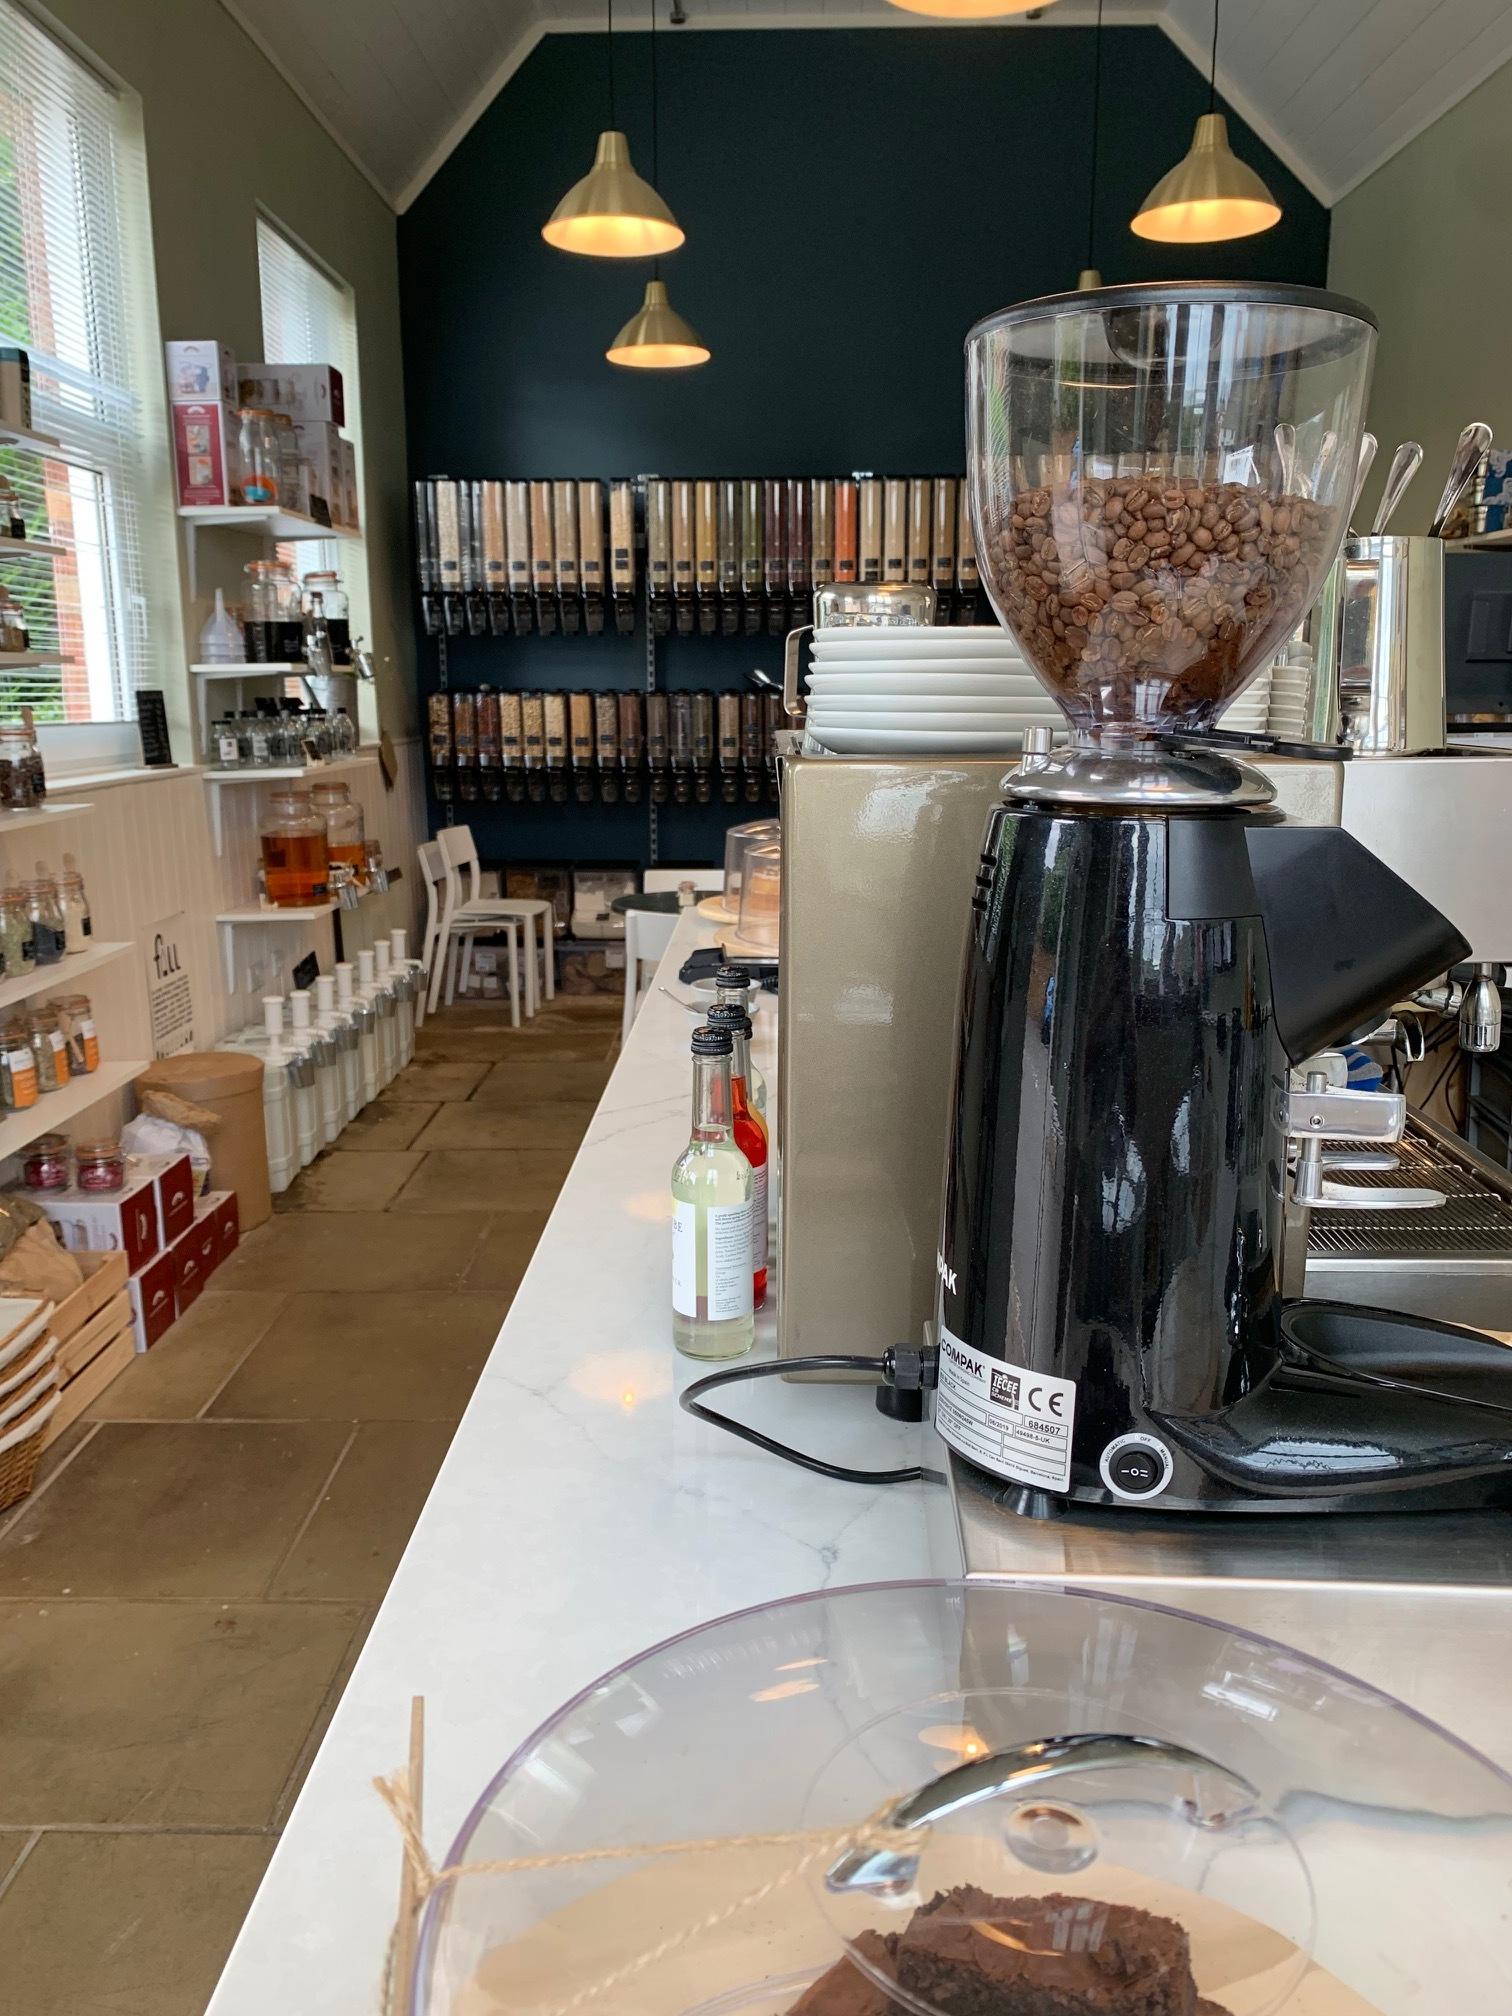 Favourite things - Coffee, cake, zero waste, refills, herbs & spice…